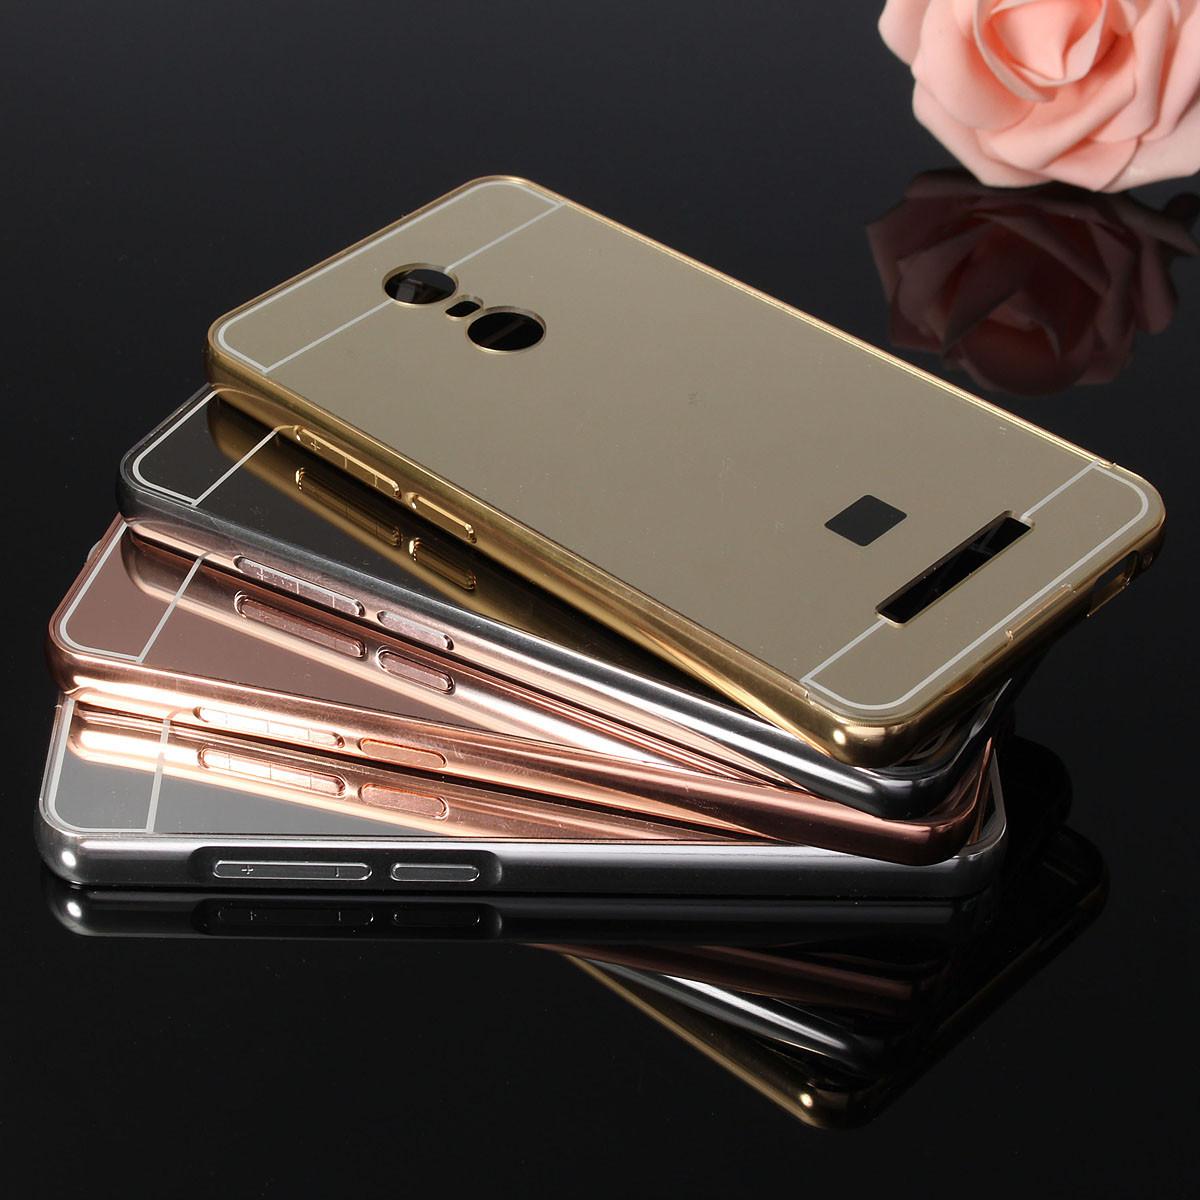 ... 2 Source Jual Bumper Mirror Case Xiaomi Redmi Note 3 Aluminium Metal Slide